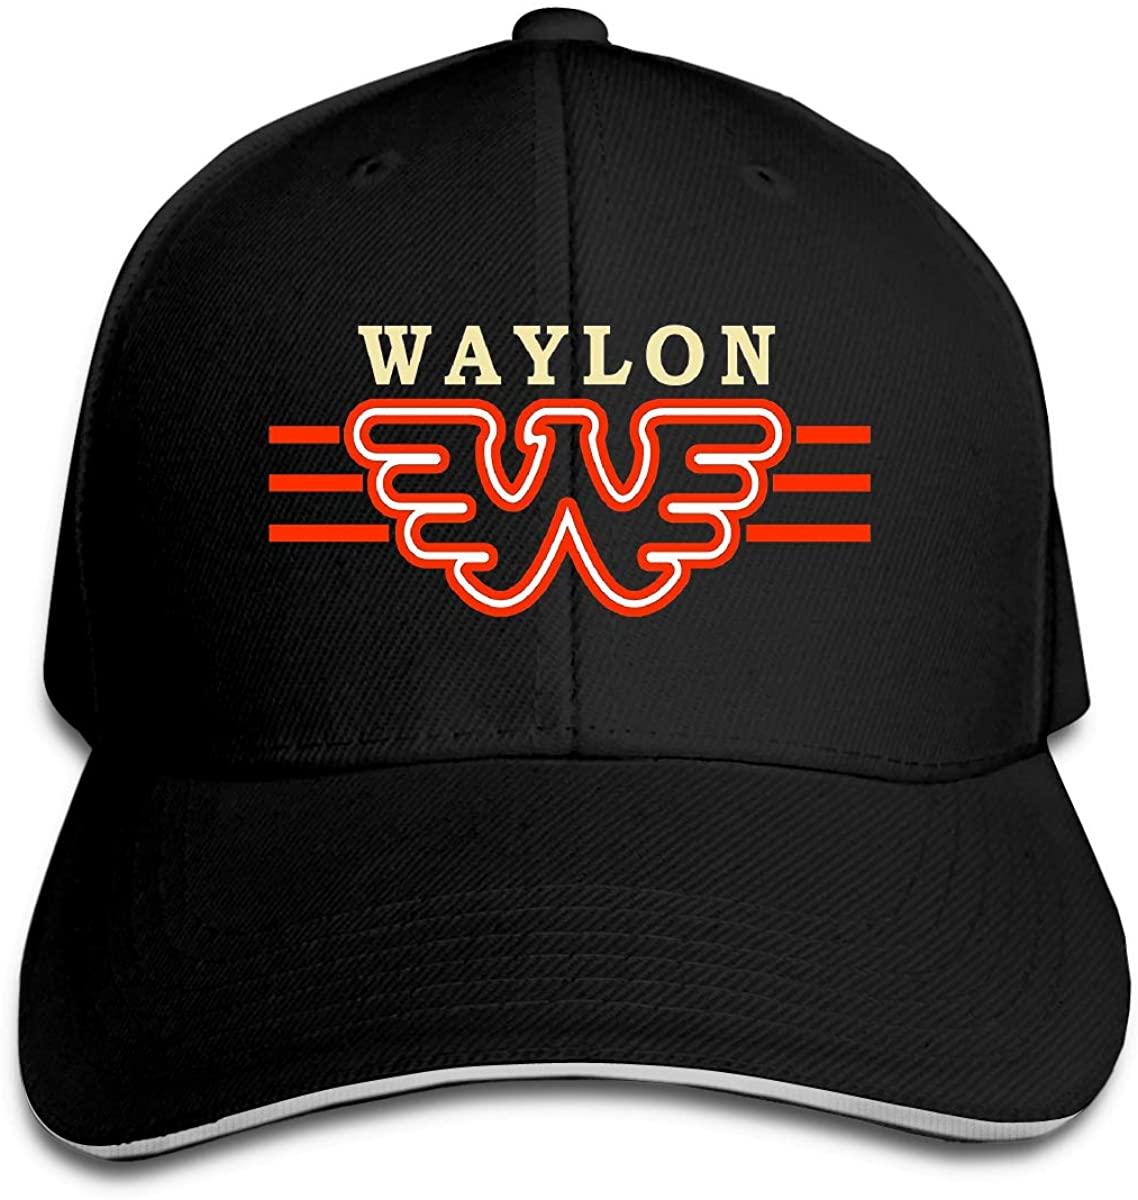 LEONNER Waylon Jennings Fashion Baseball Cap Leisure Casquette Cap Breathable Hat